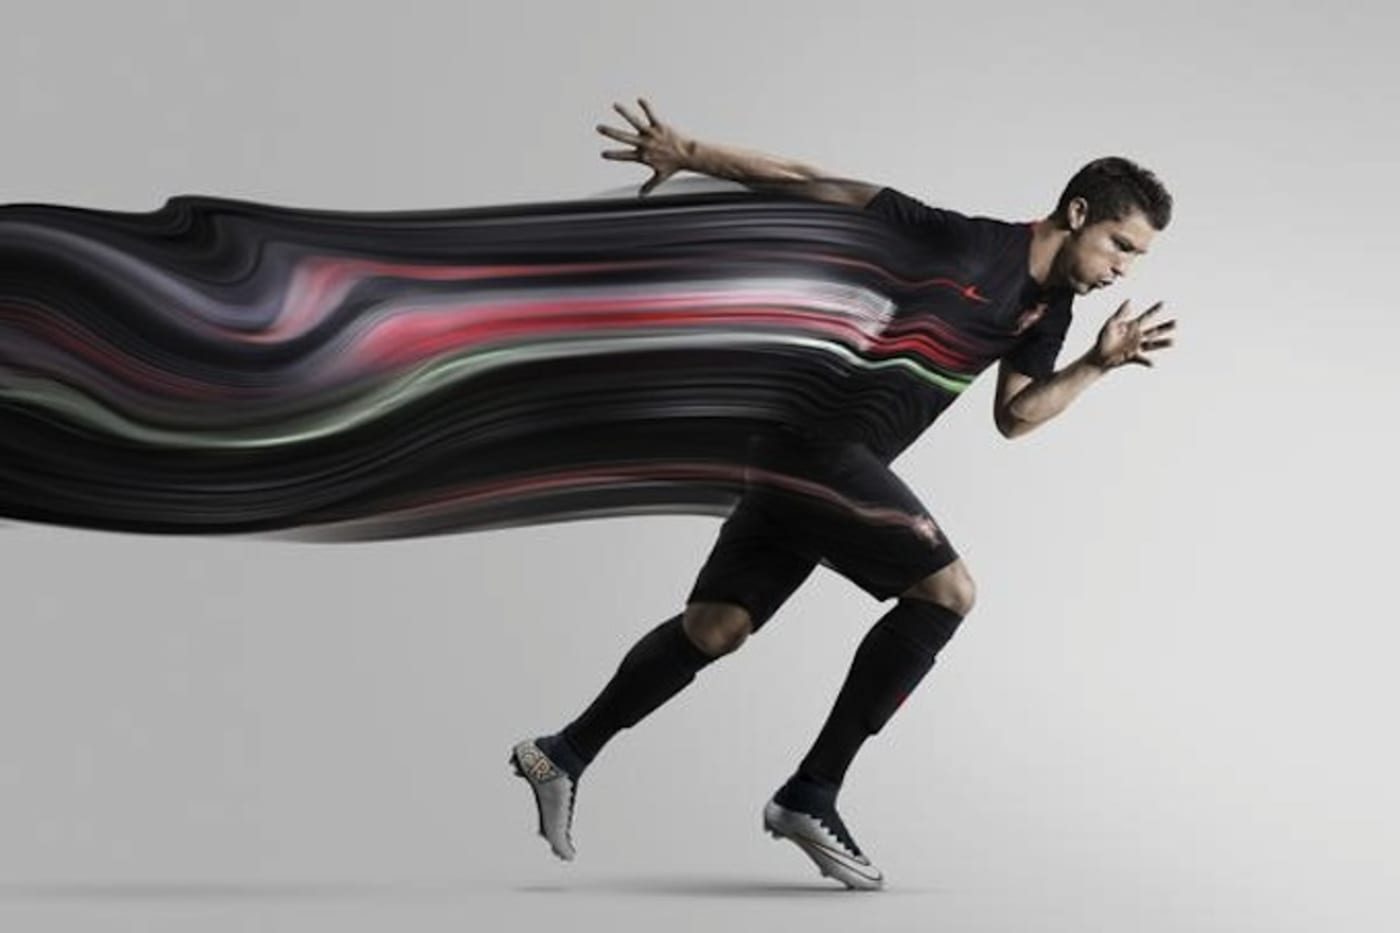 Cristiano Ronaldo Image